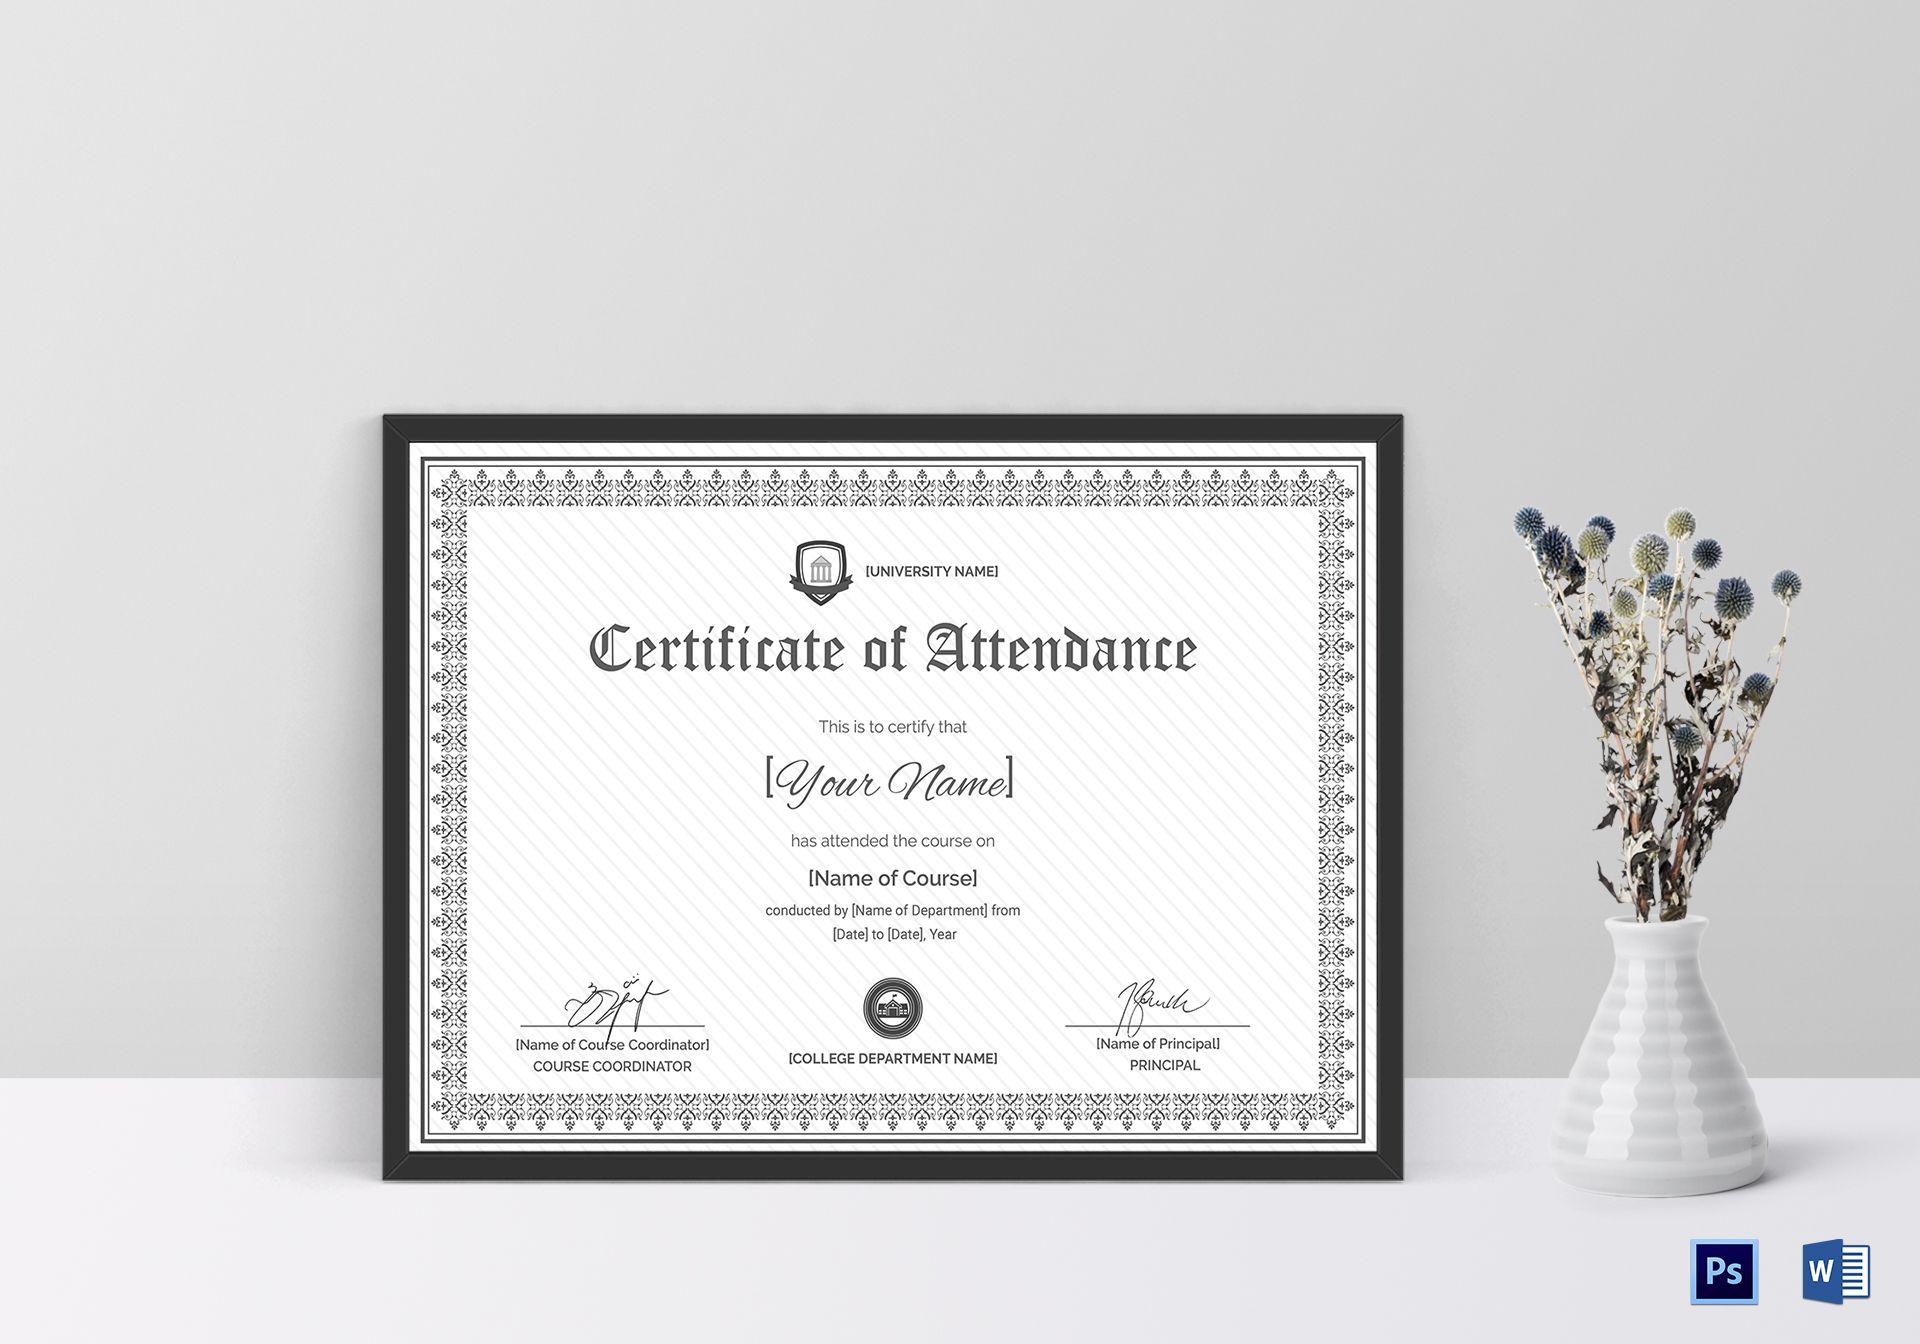 Course Attendance Certificate Design Template In Psd Word